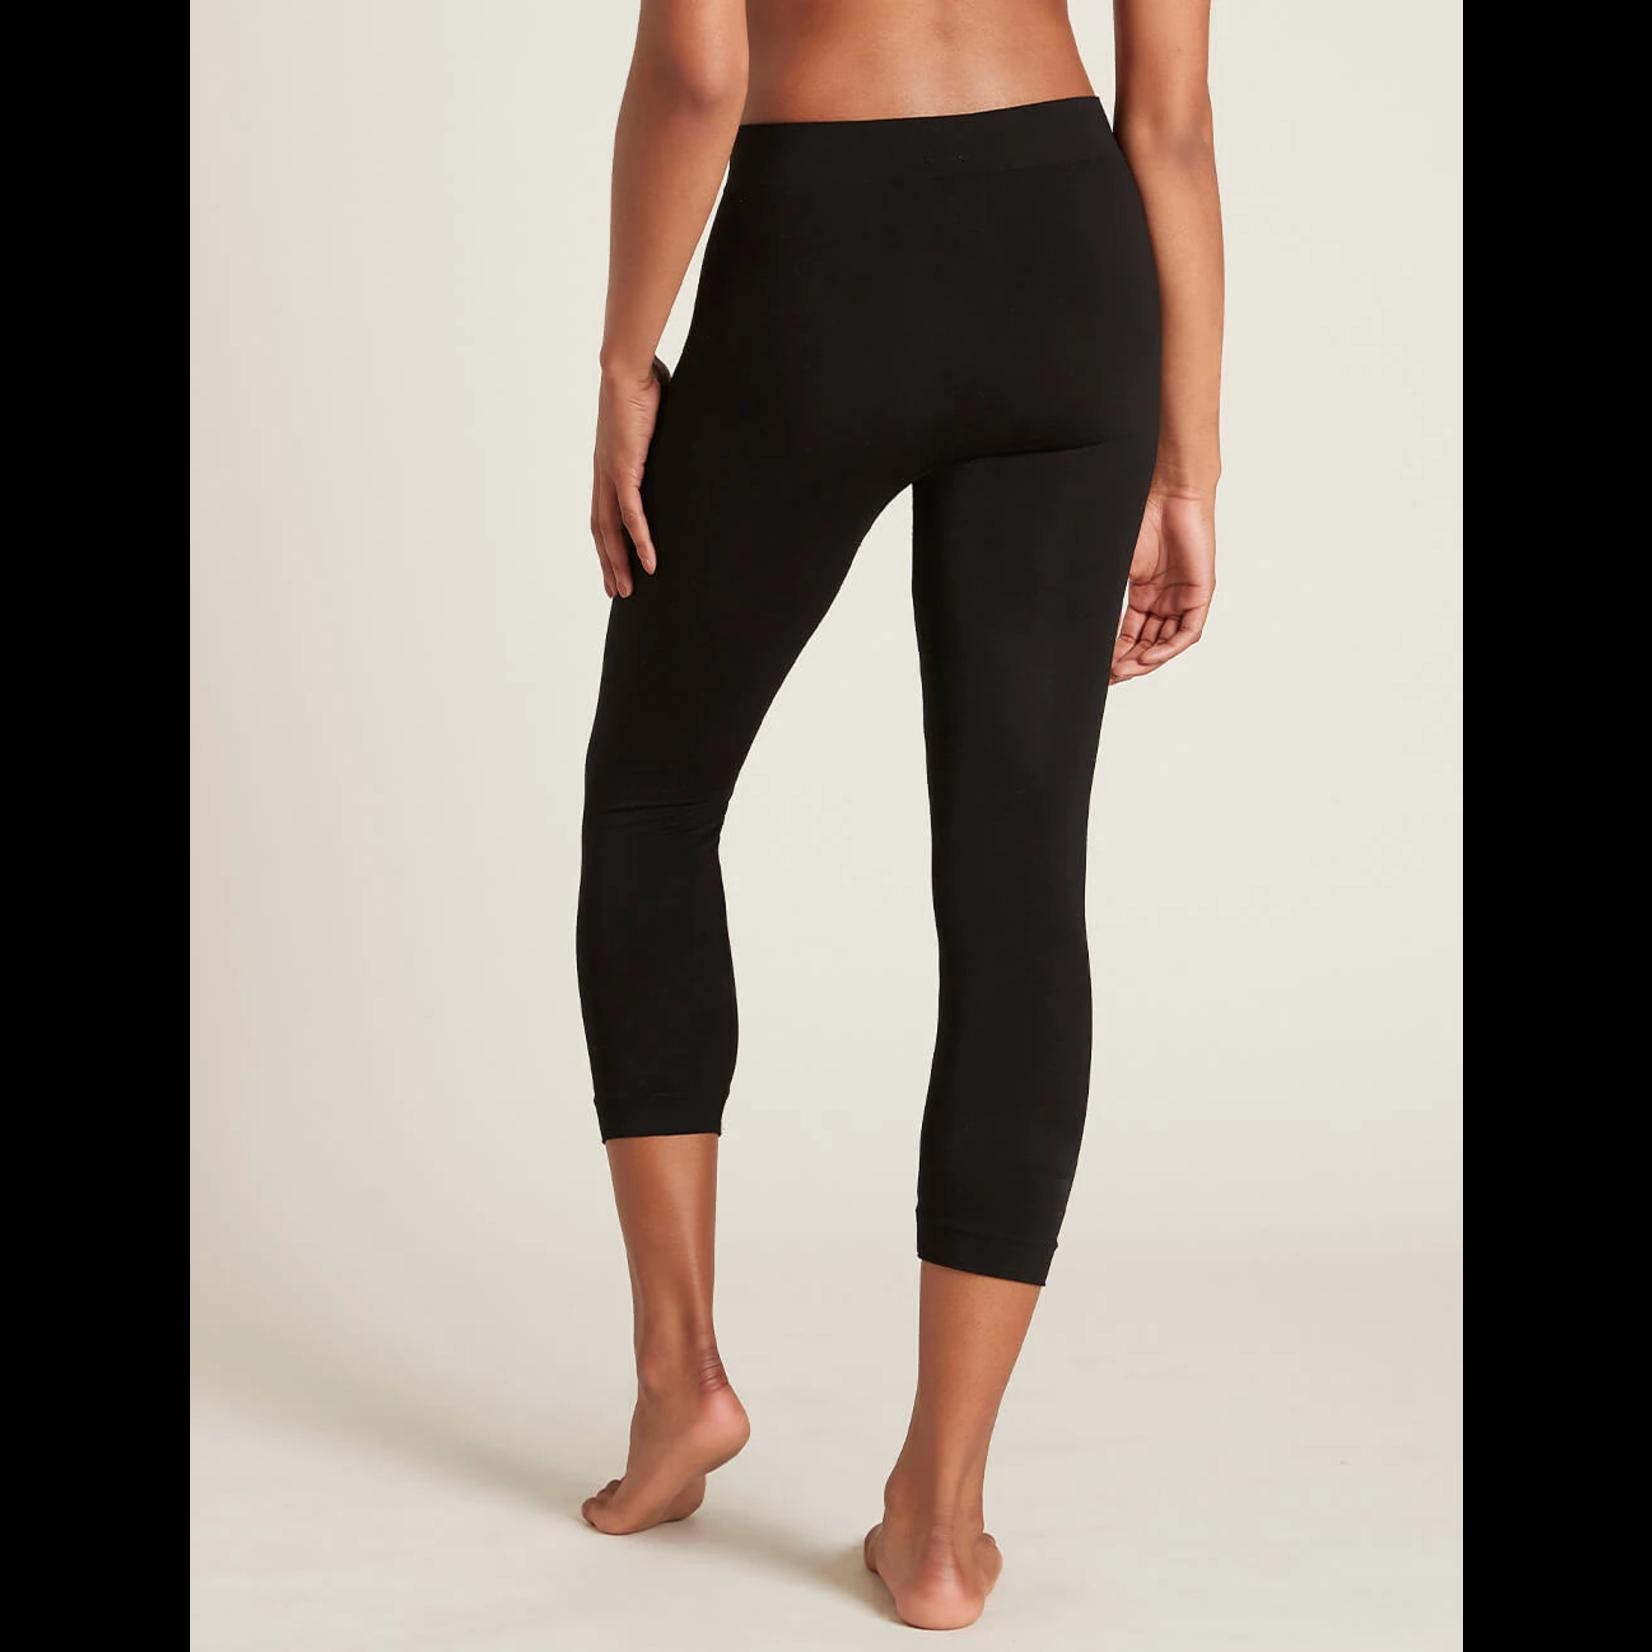 Boody Boody Women's 3/4 Leggings Black